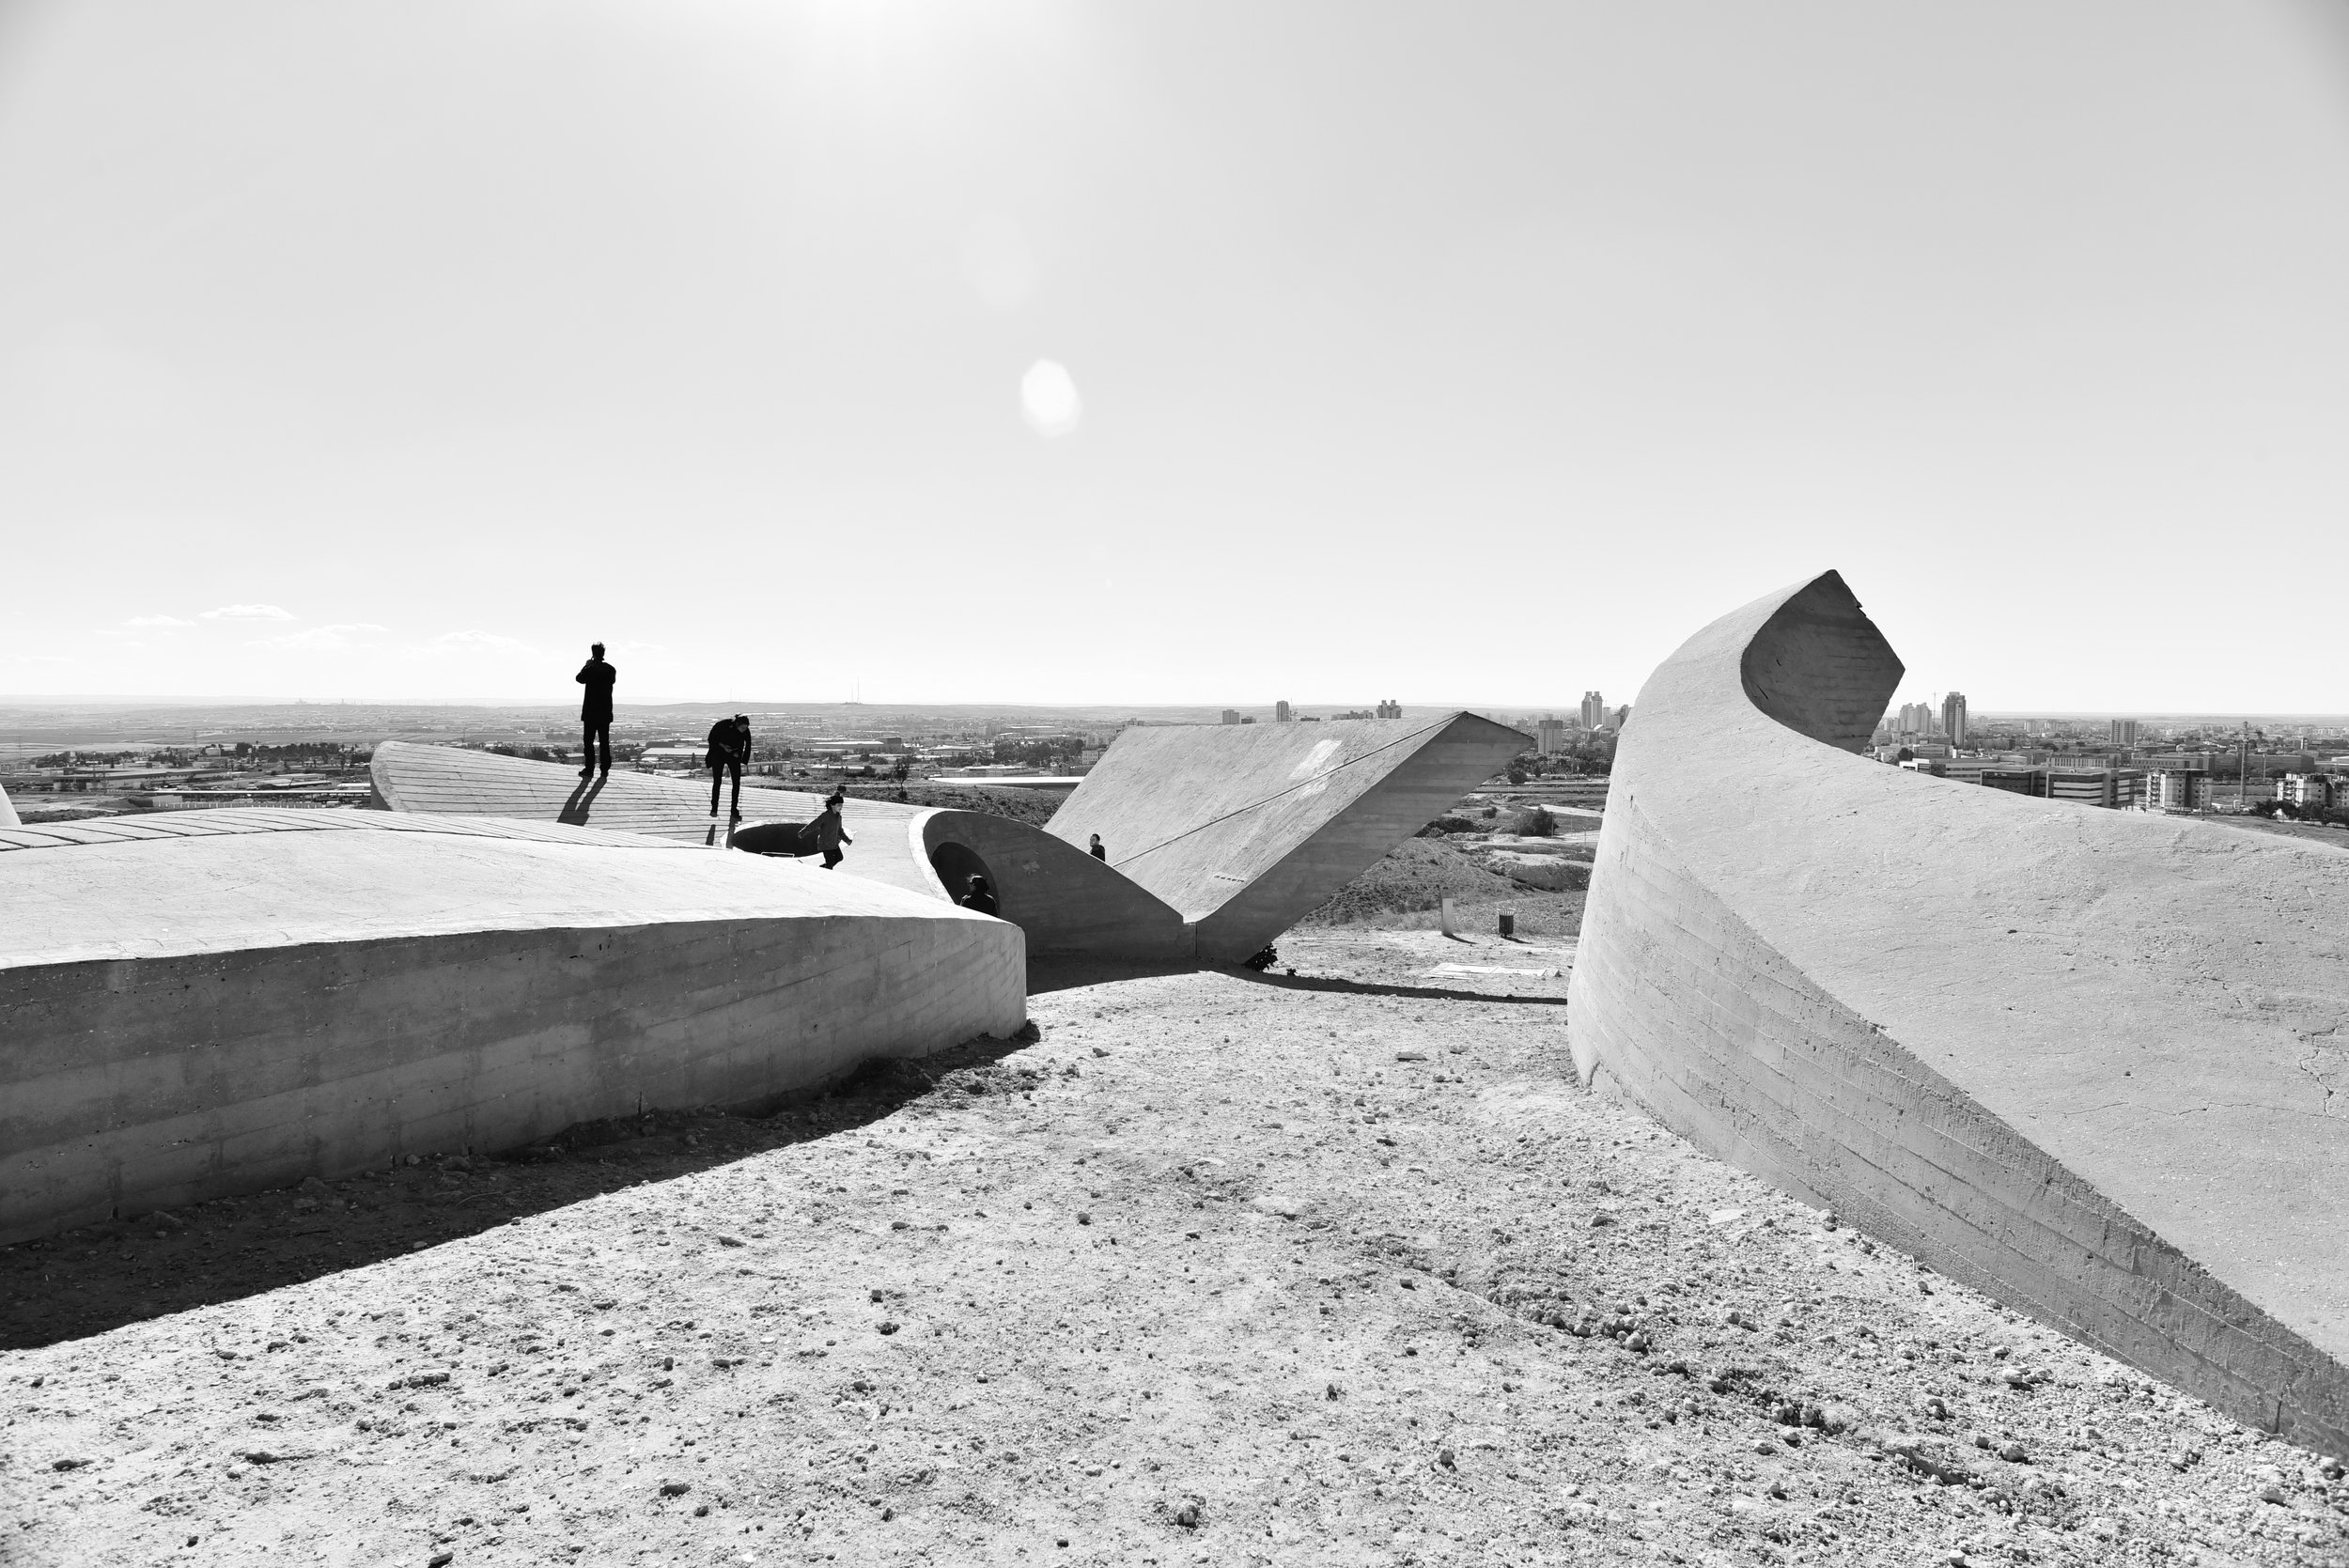 Monument to the Negev Brigade,Be'er Scheva, Israel